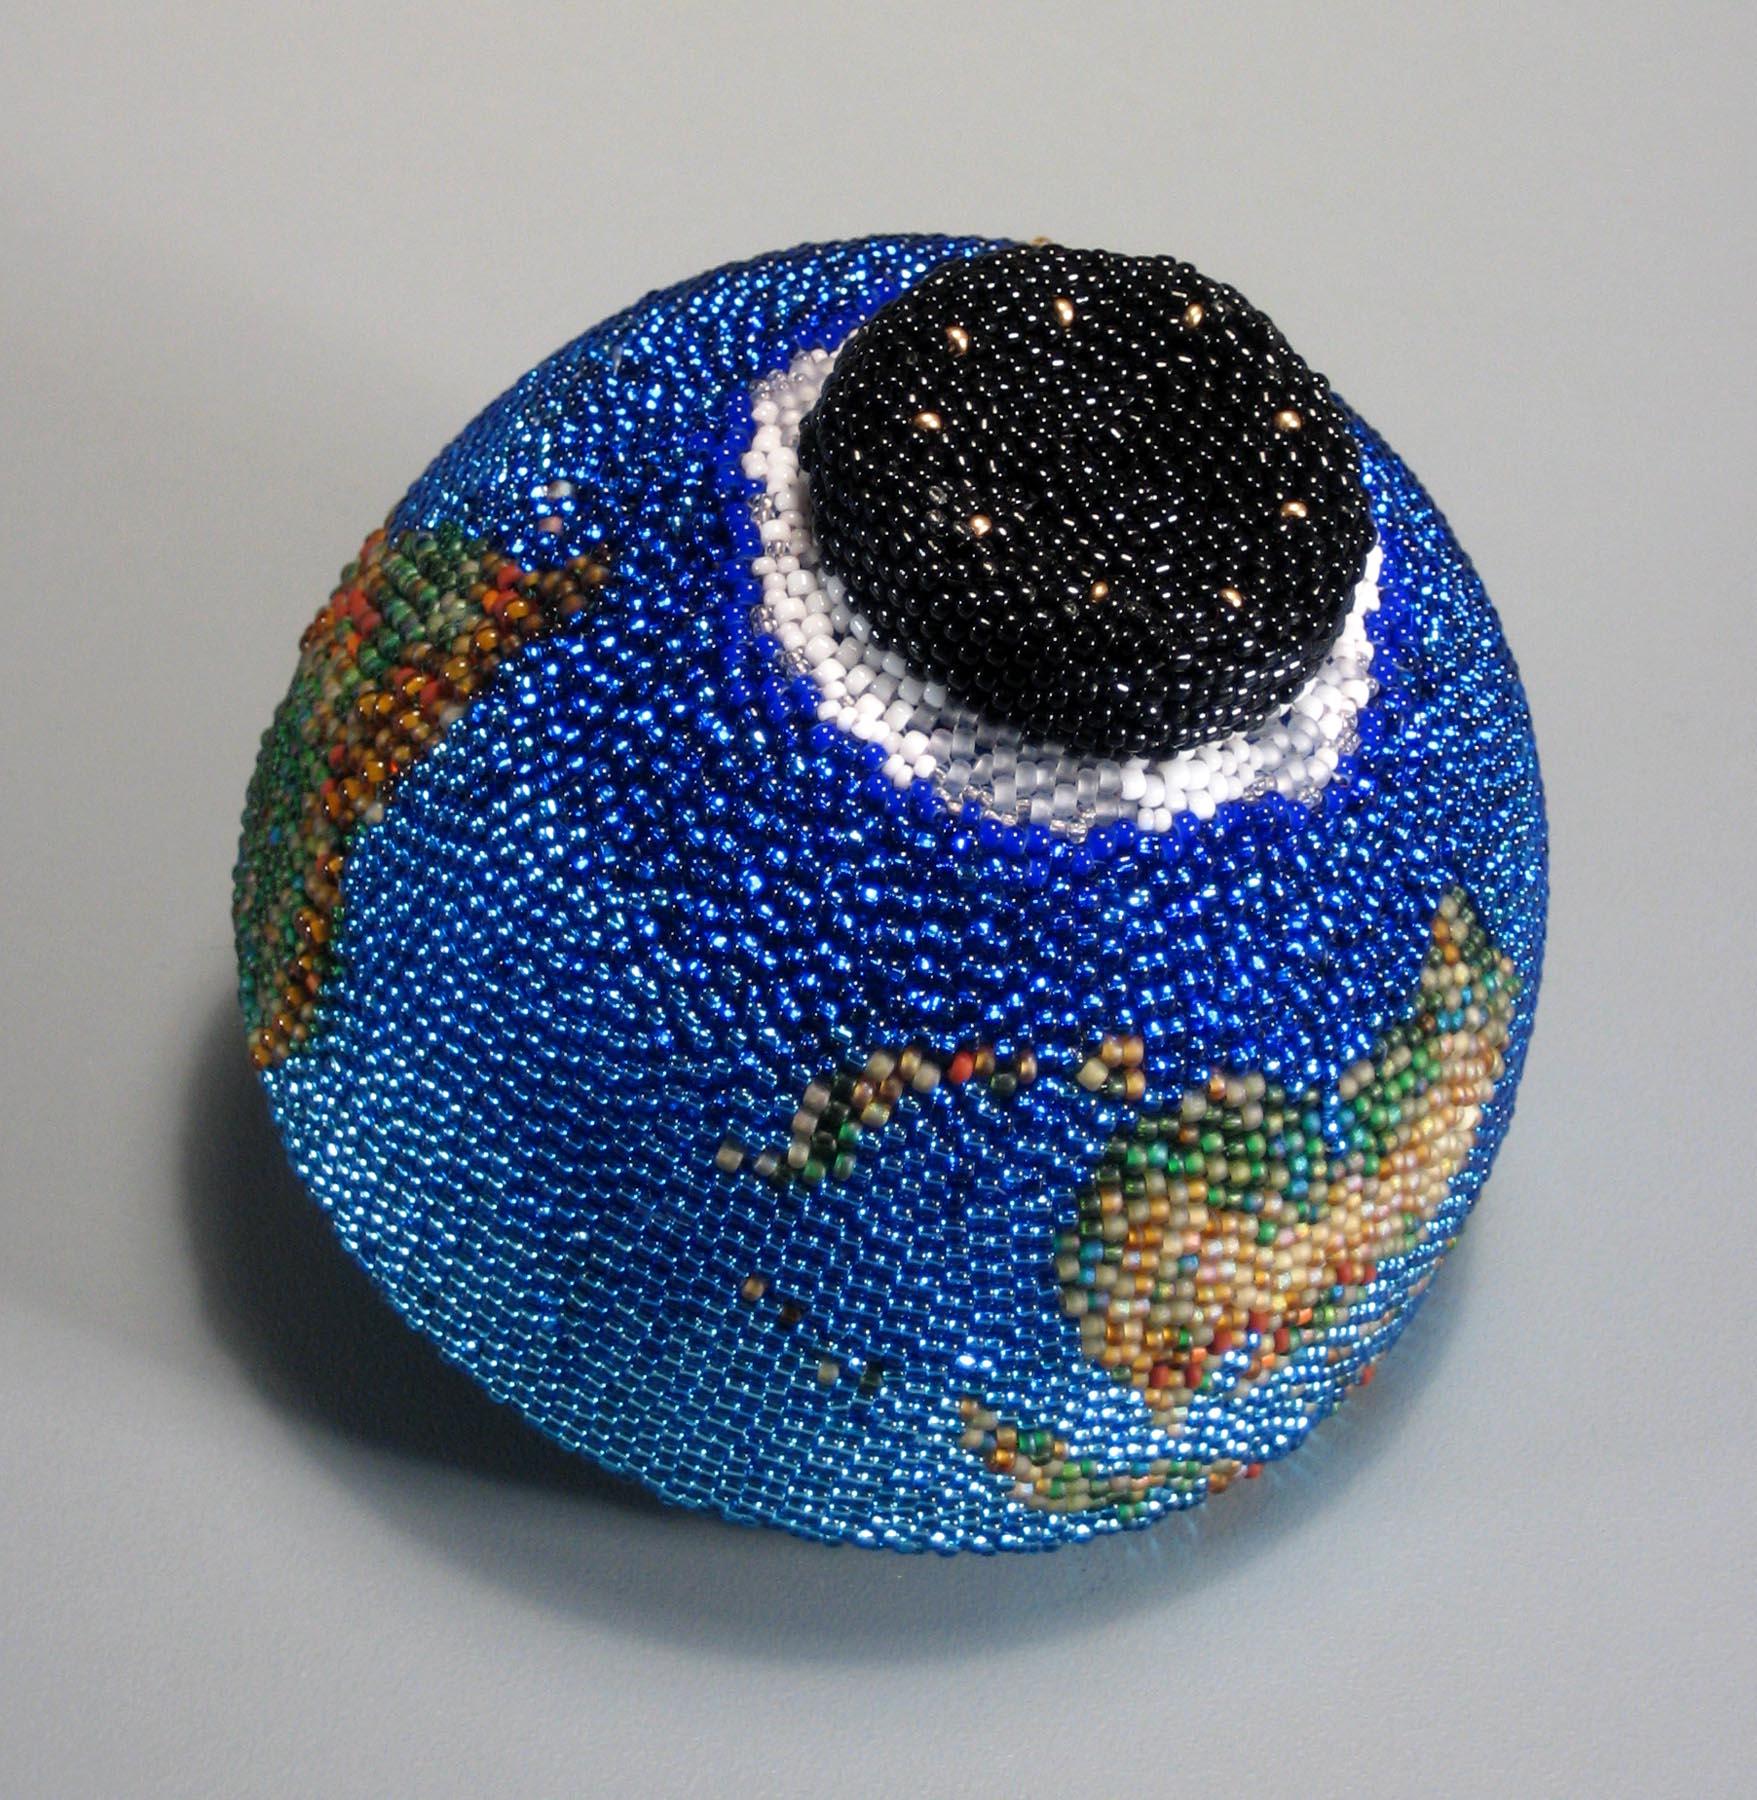 southern-hemisphere-bottom1